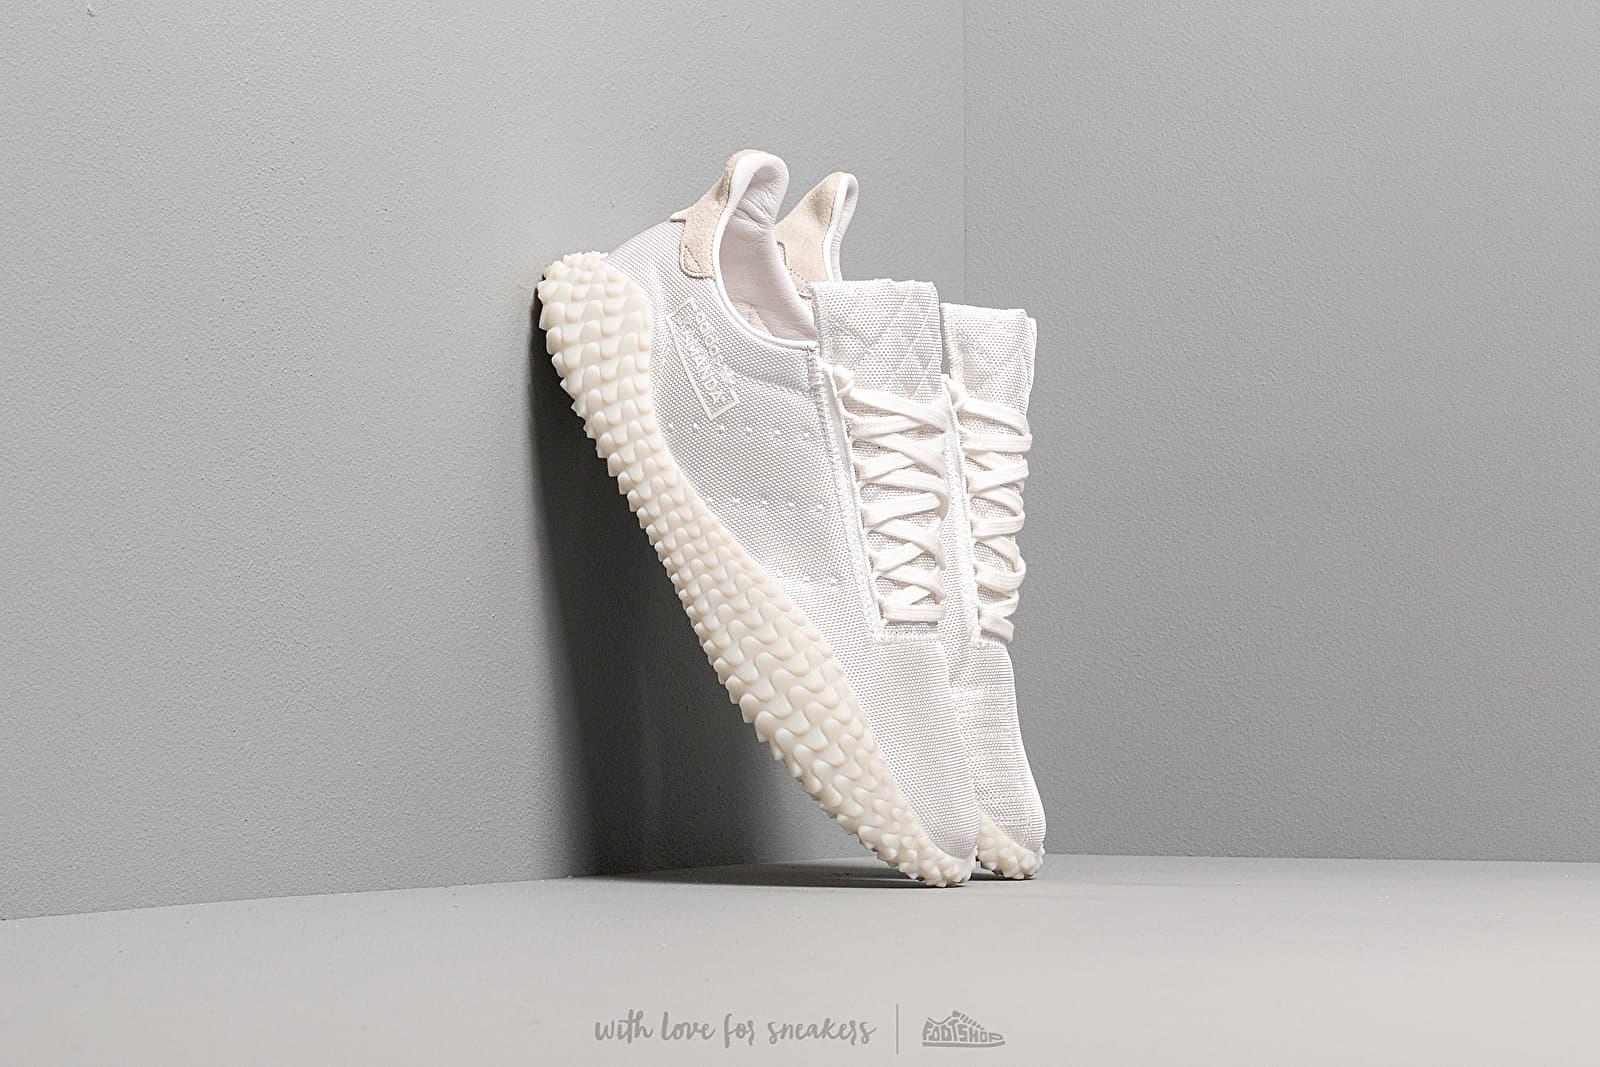 Pánské tenisky a boty adidas Kamanda Ftw White/ Ftw White/ Raw White